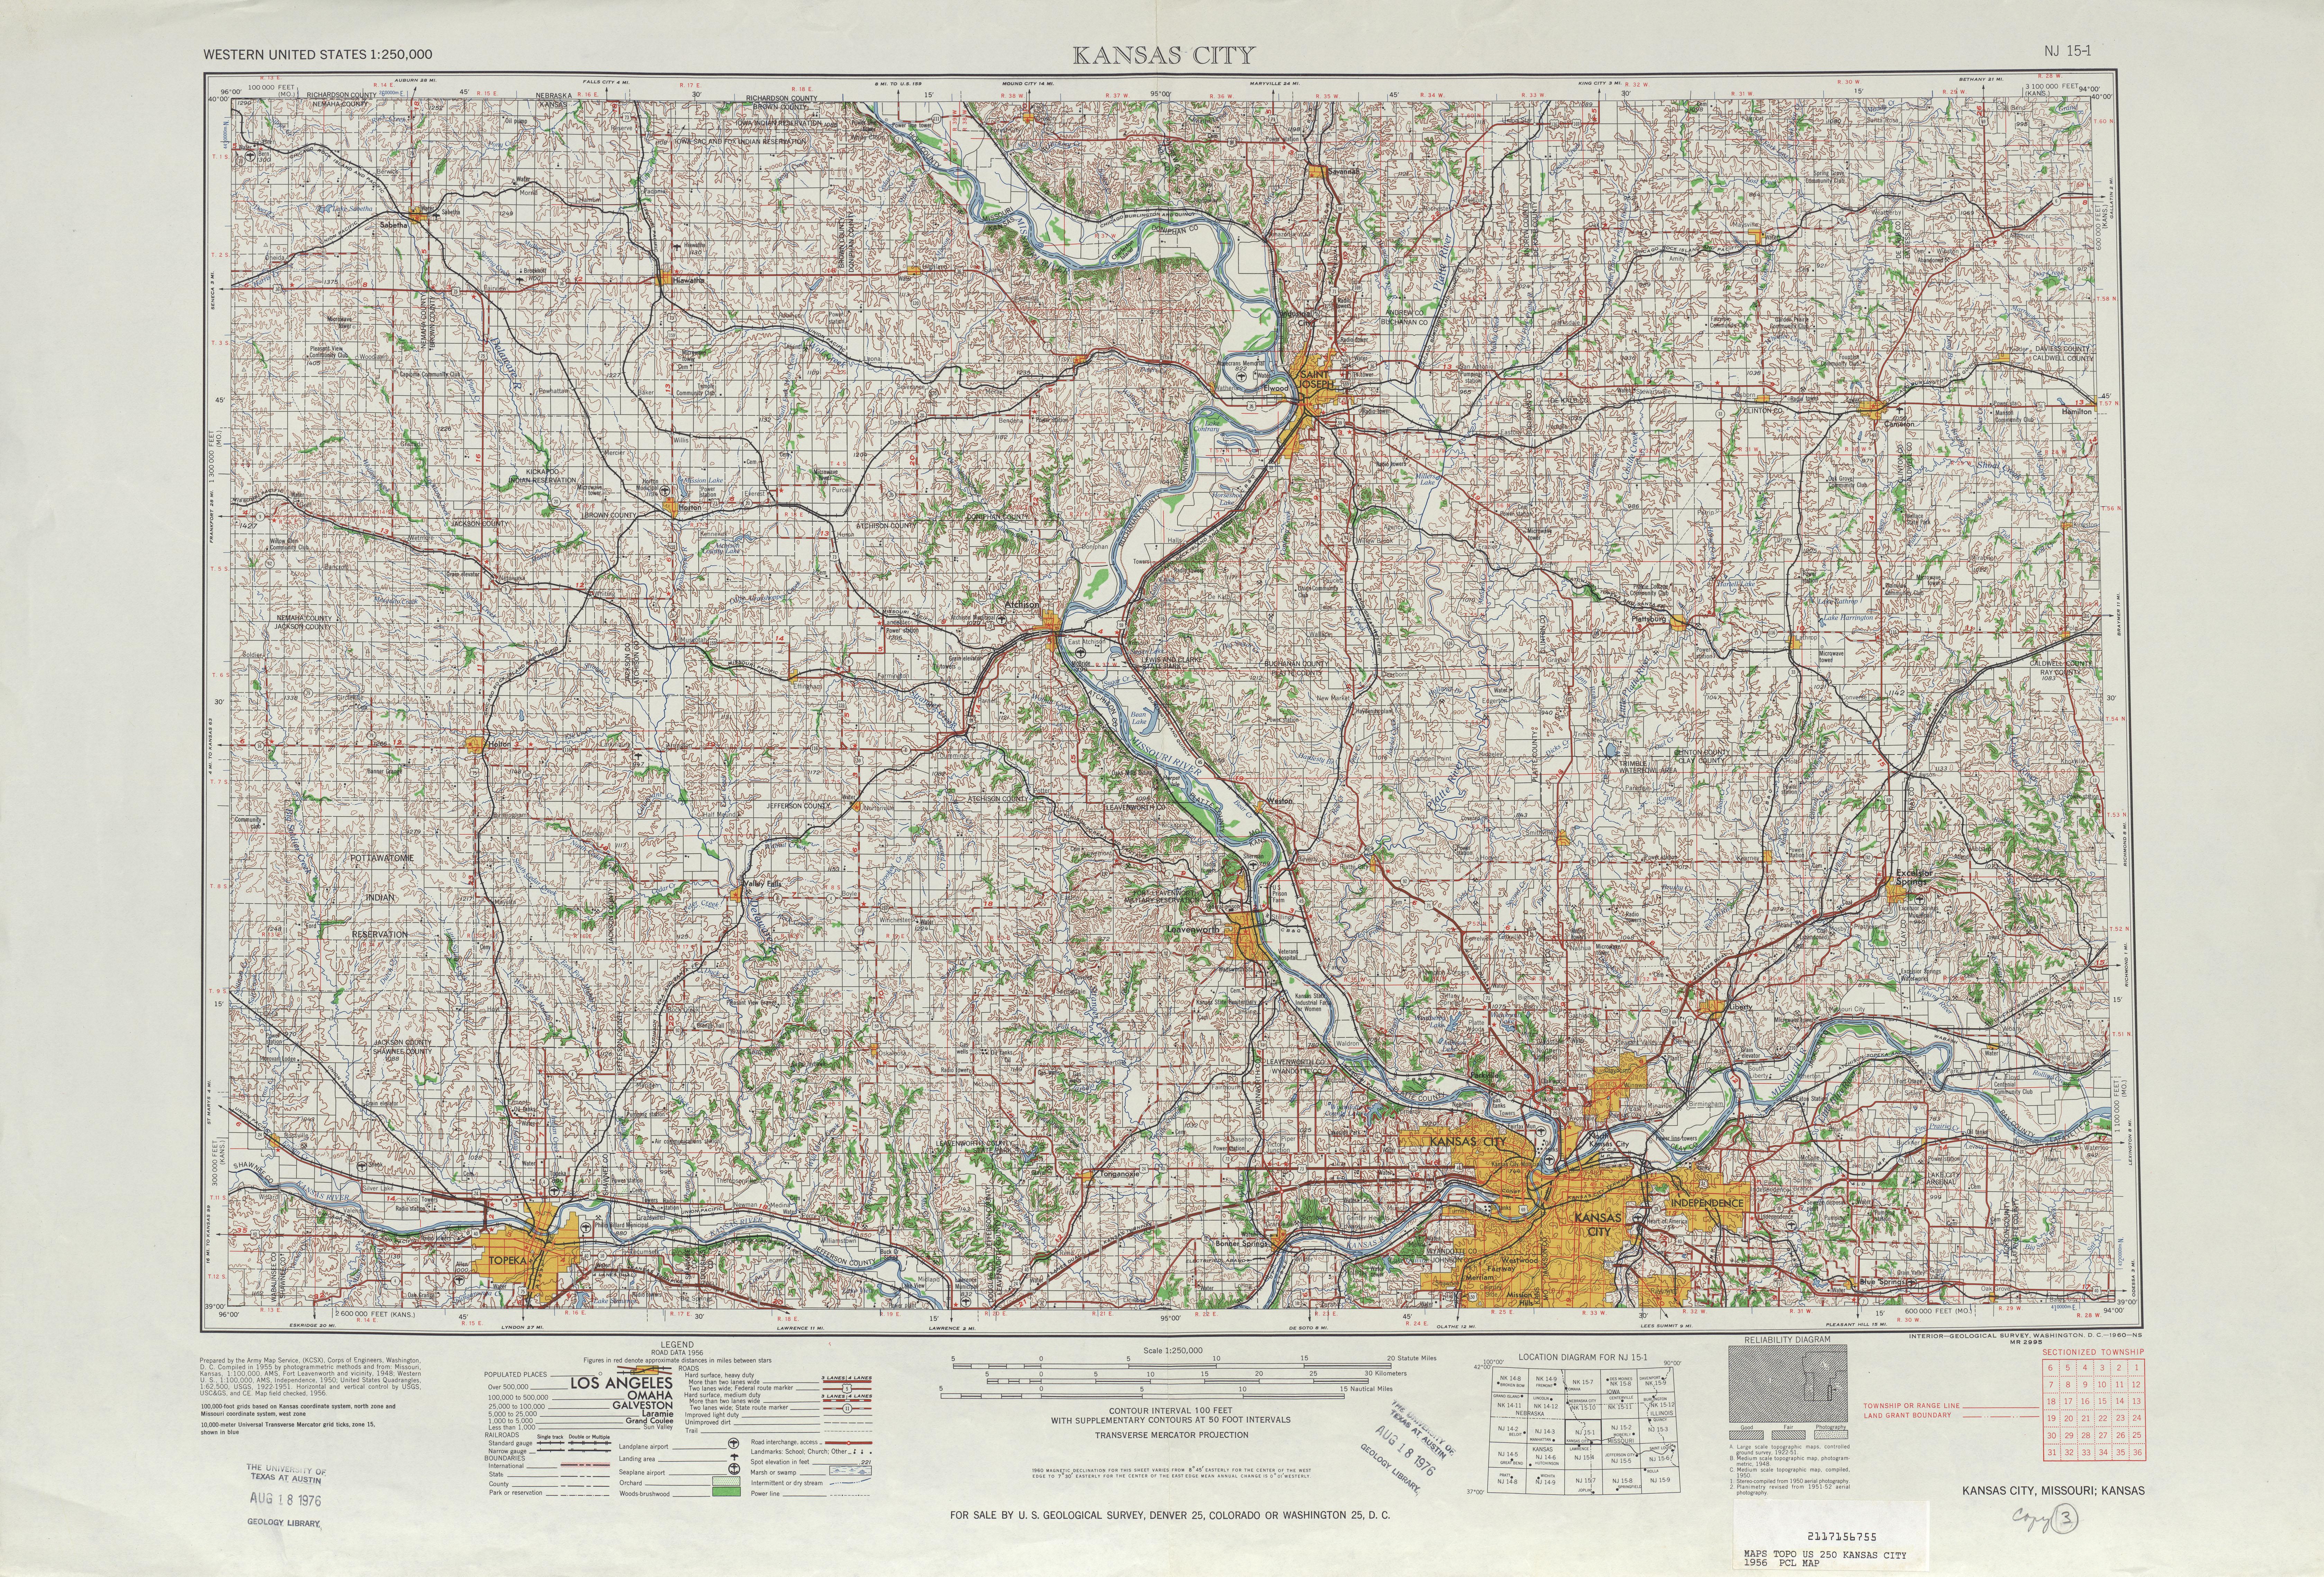 Kansas City Topographic Map Sheet United States 1956